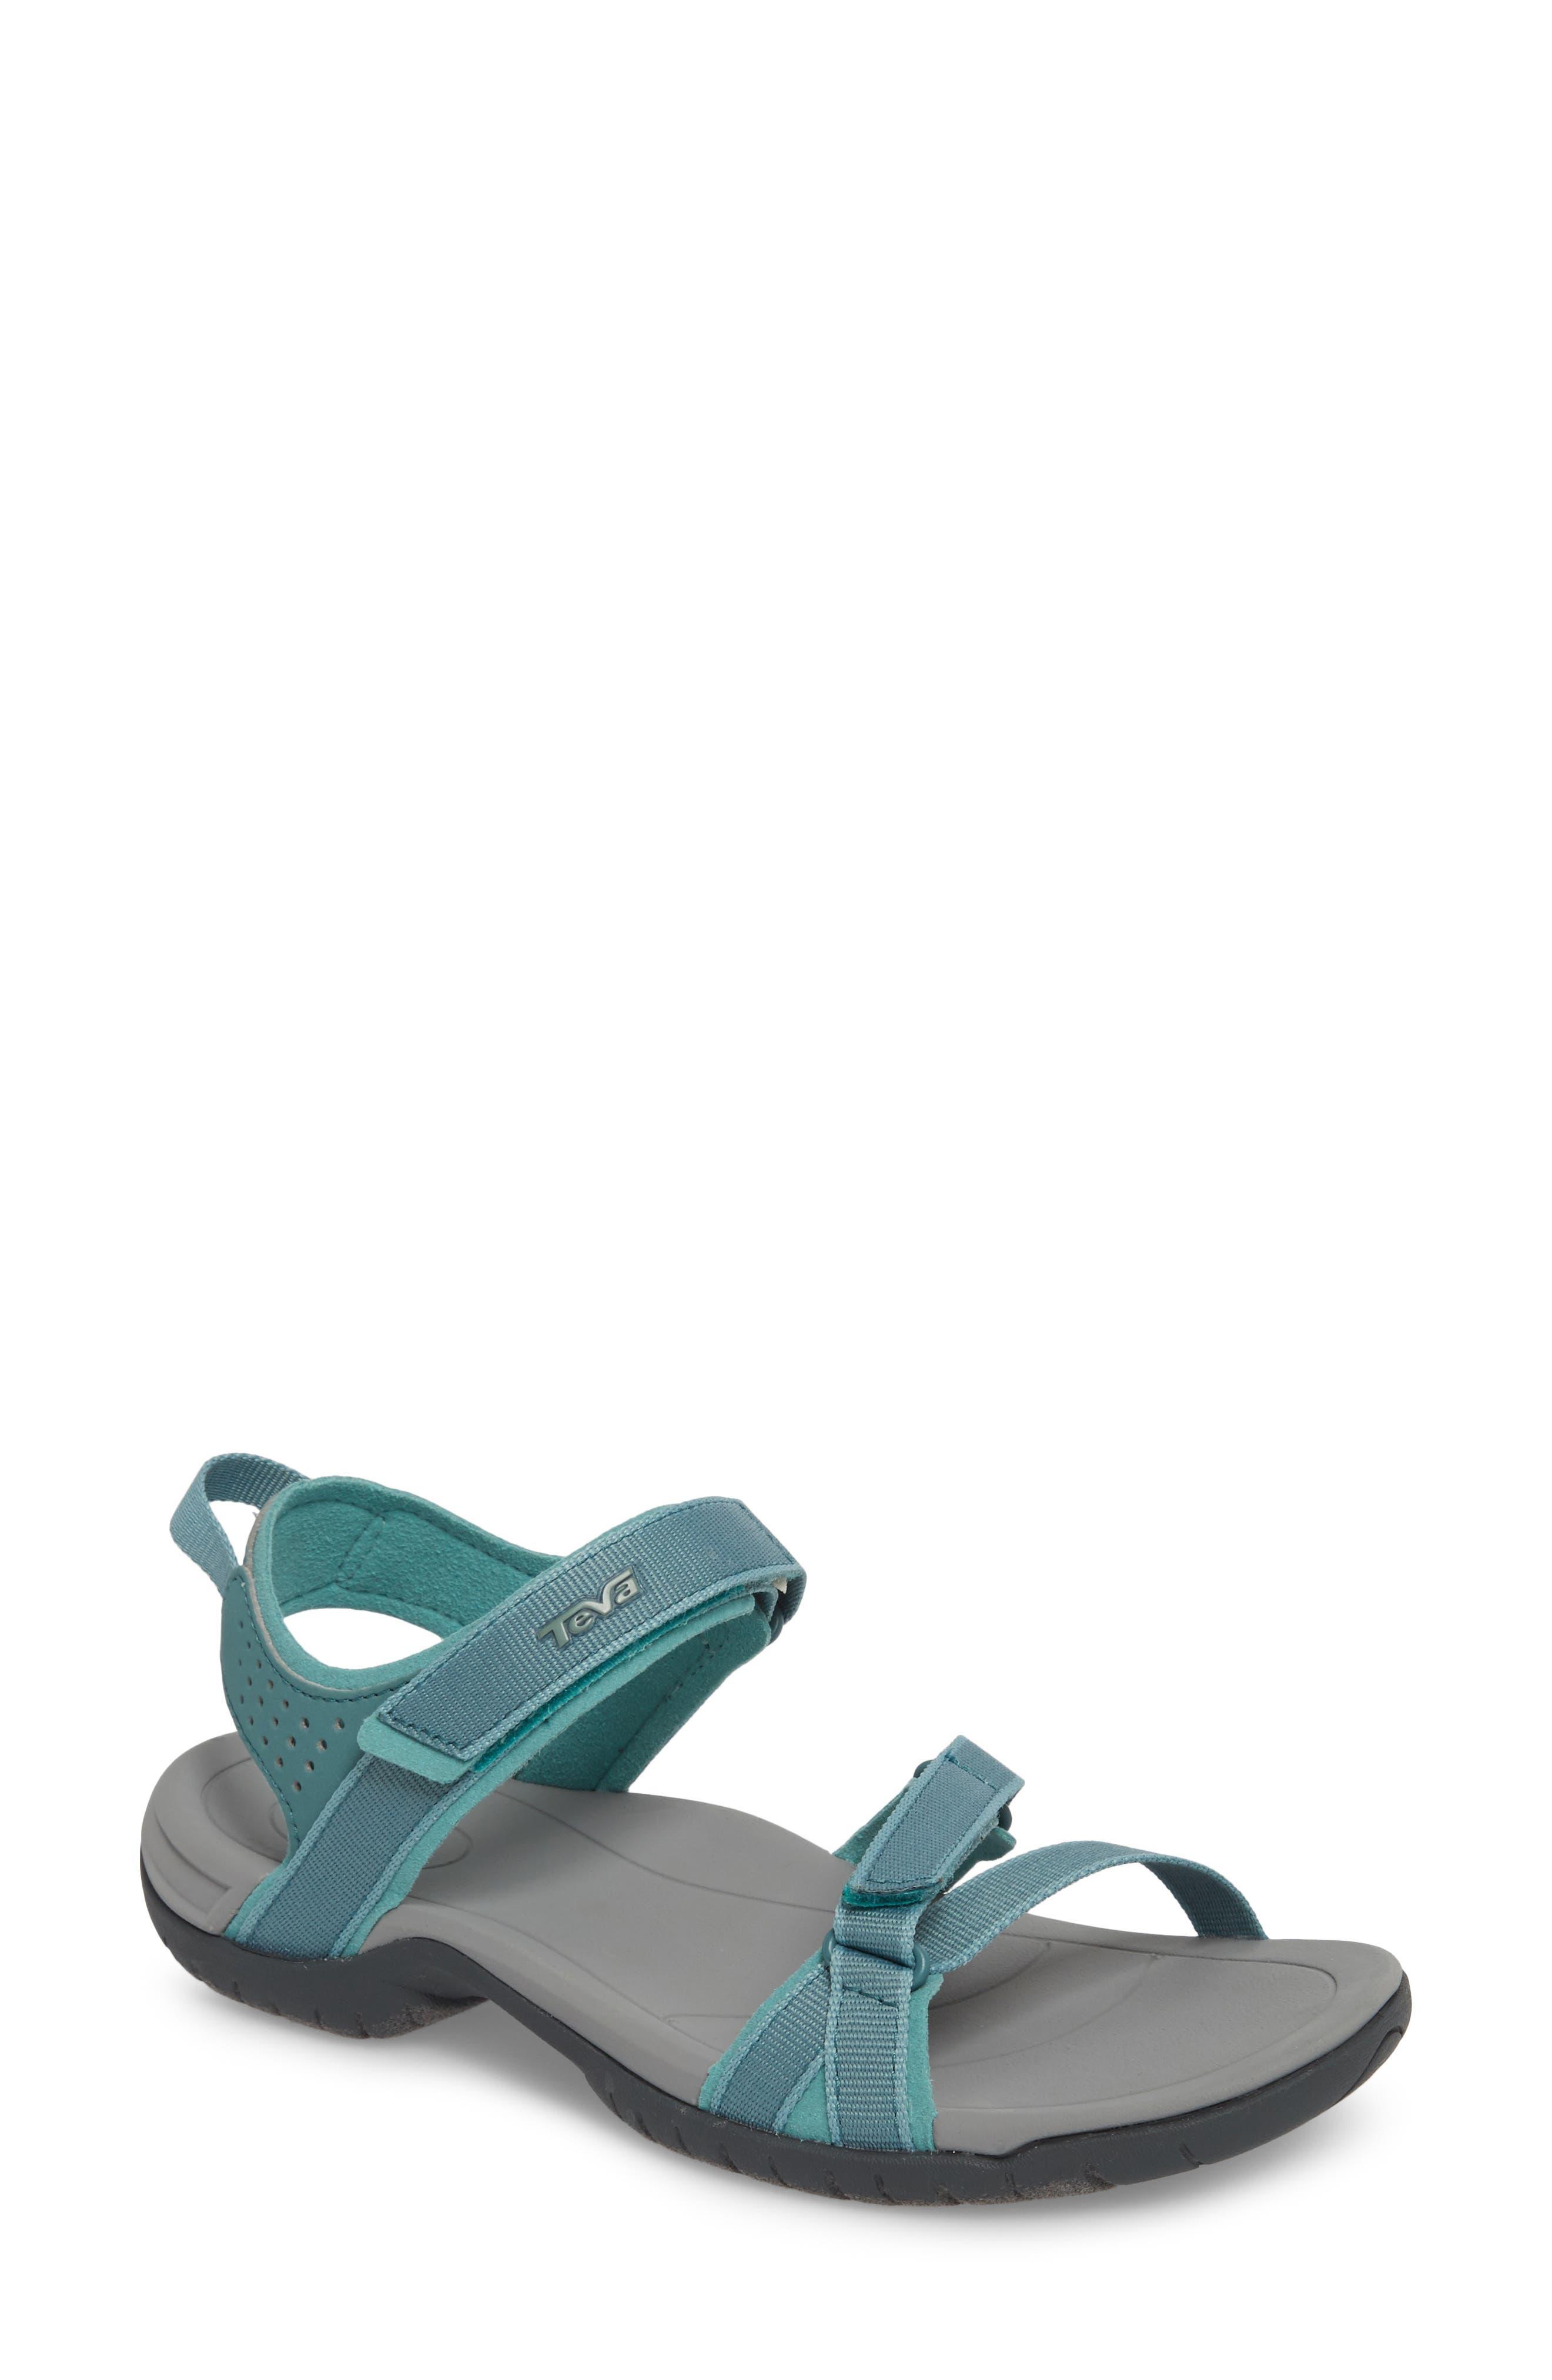 'Verra' Sandal,                         Main,                         color, NORTH ATLANTIC